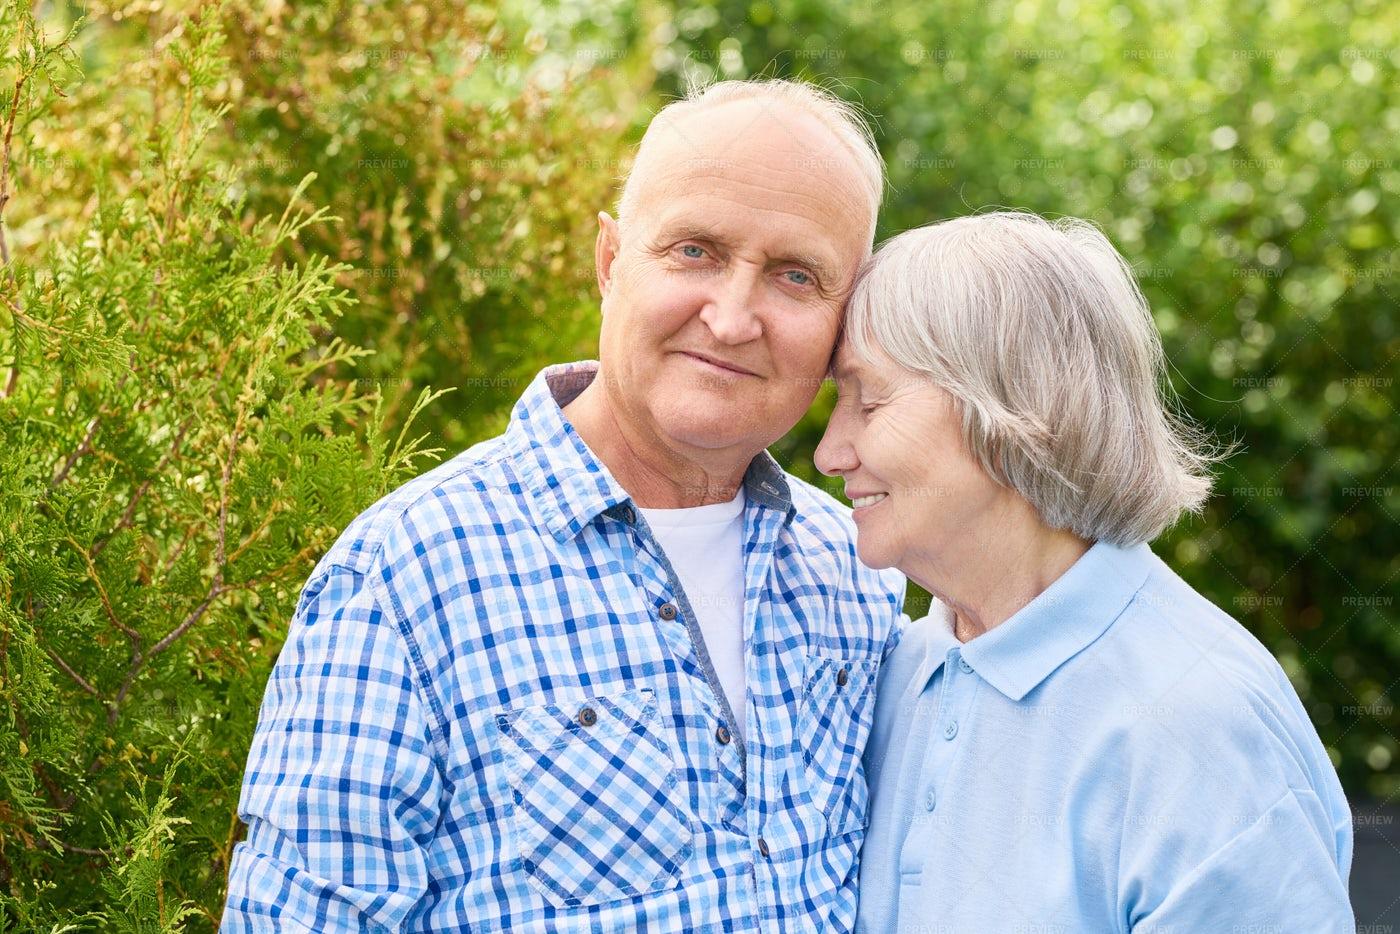 Happy  Long Marriage: Stock Photos